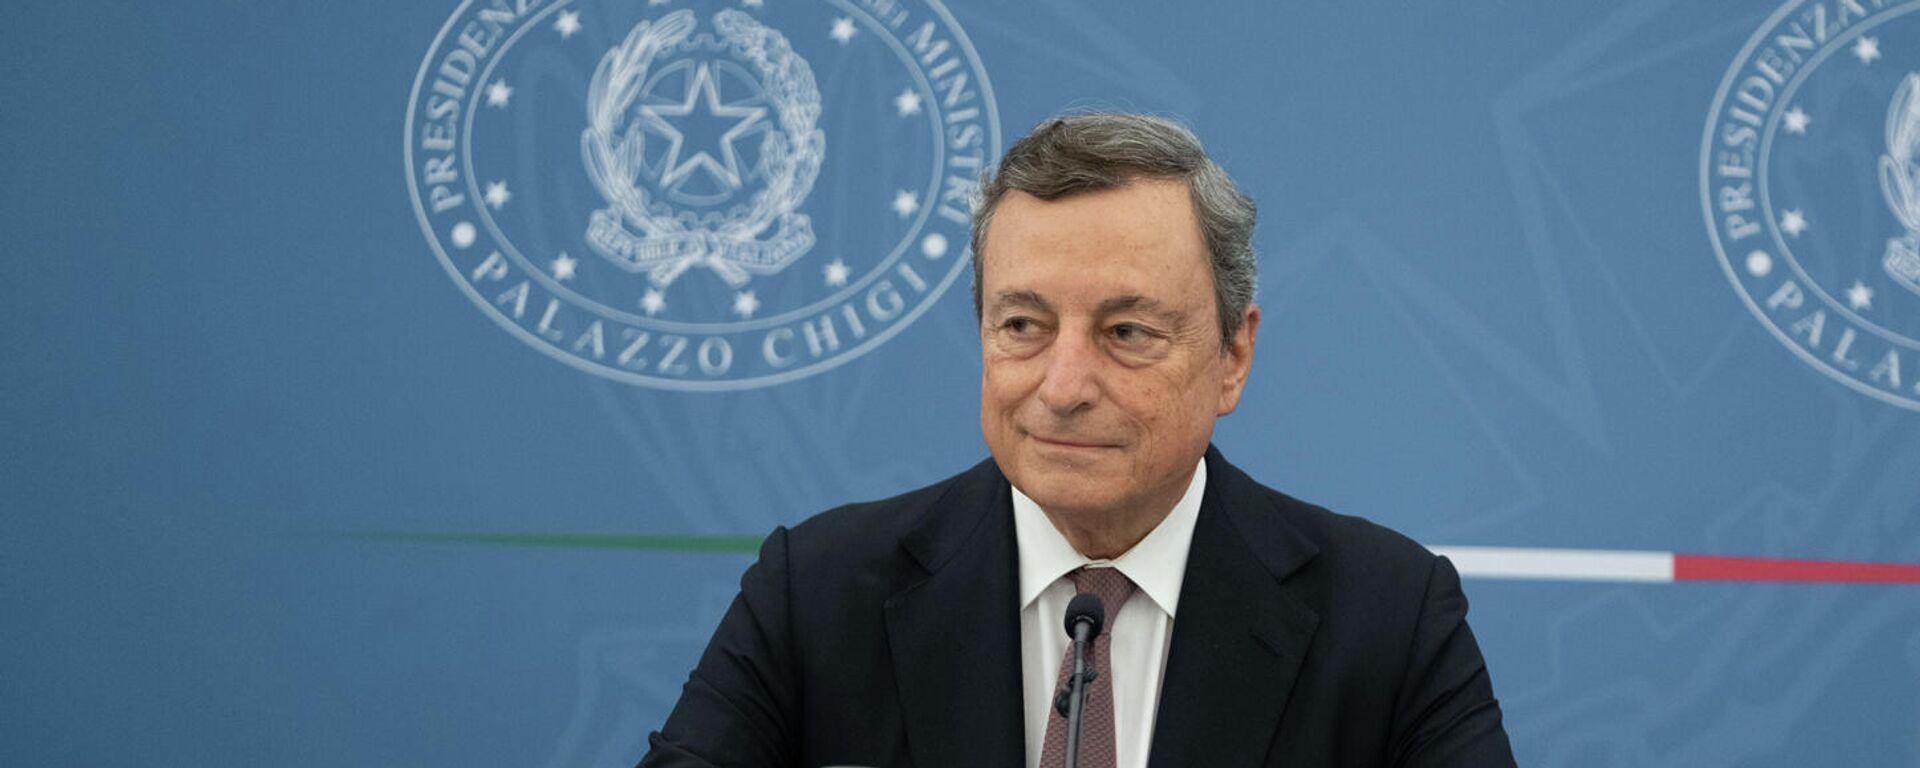 Conferenza stampa del Presidente Draghi  - Sputnik Italia, 1920, 06.09.2021